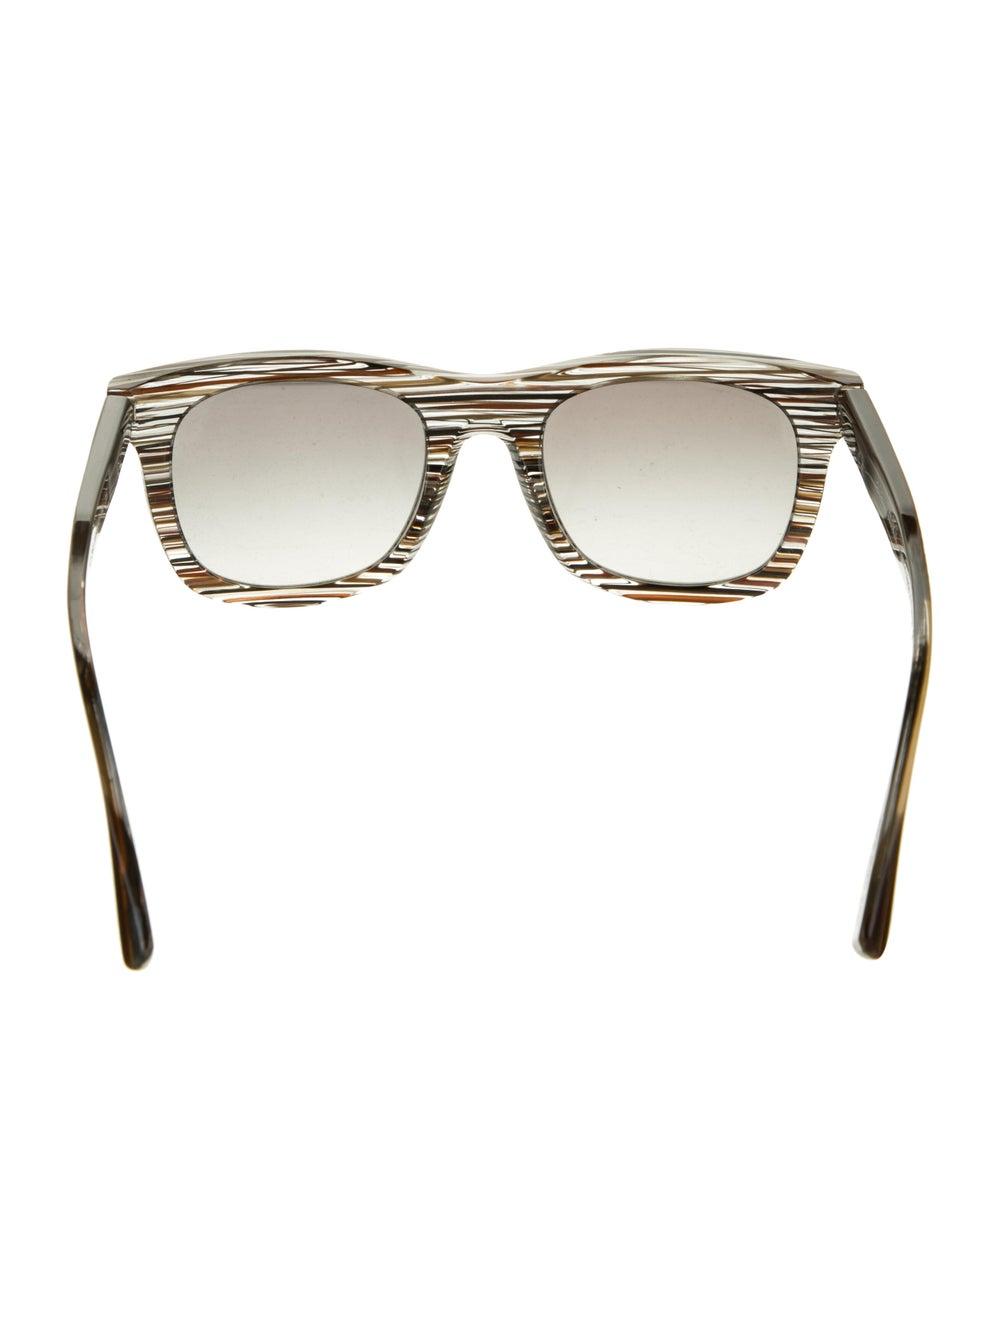 Alain Mikli Tinted Wayfarer Sunglasses Grey - image 3